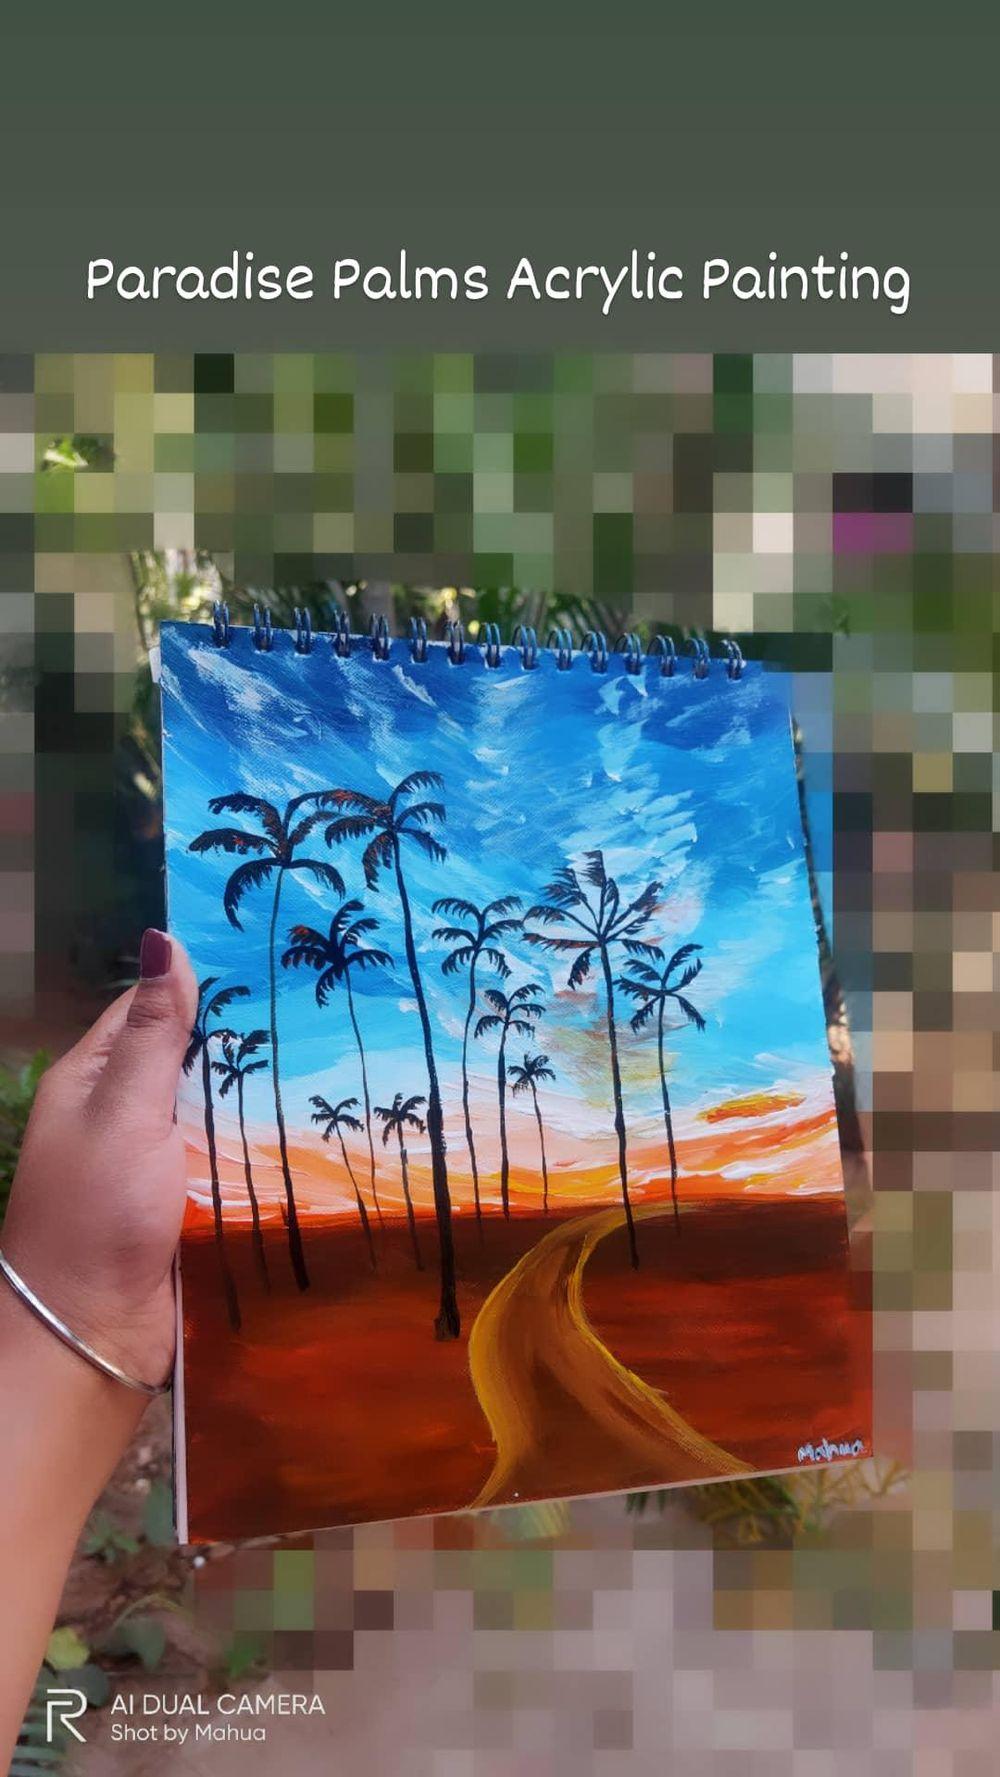 Sunset Palms - image 1 - student project